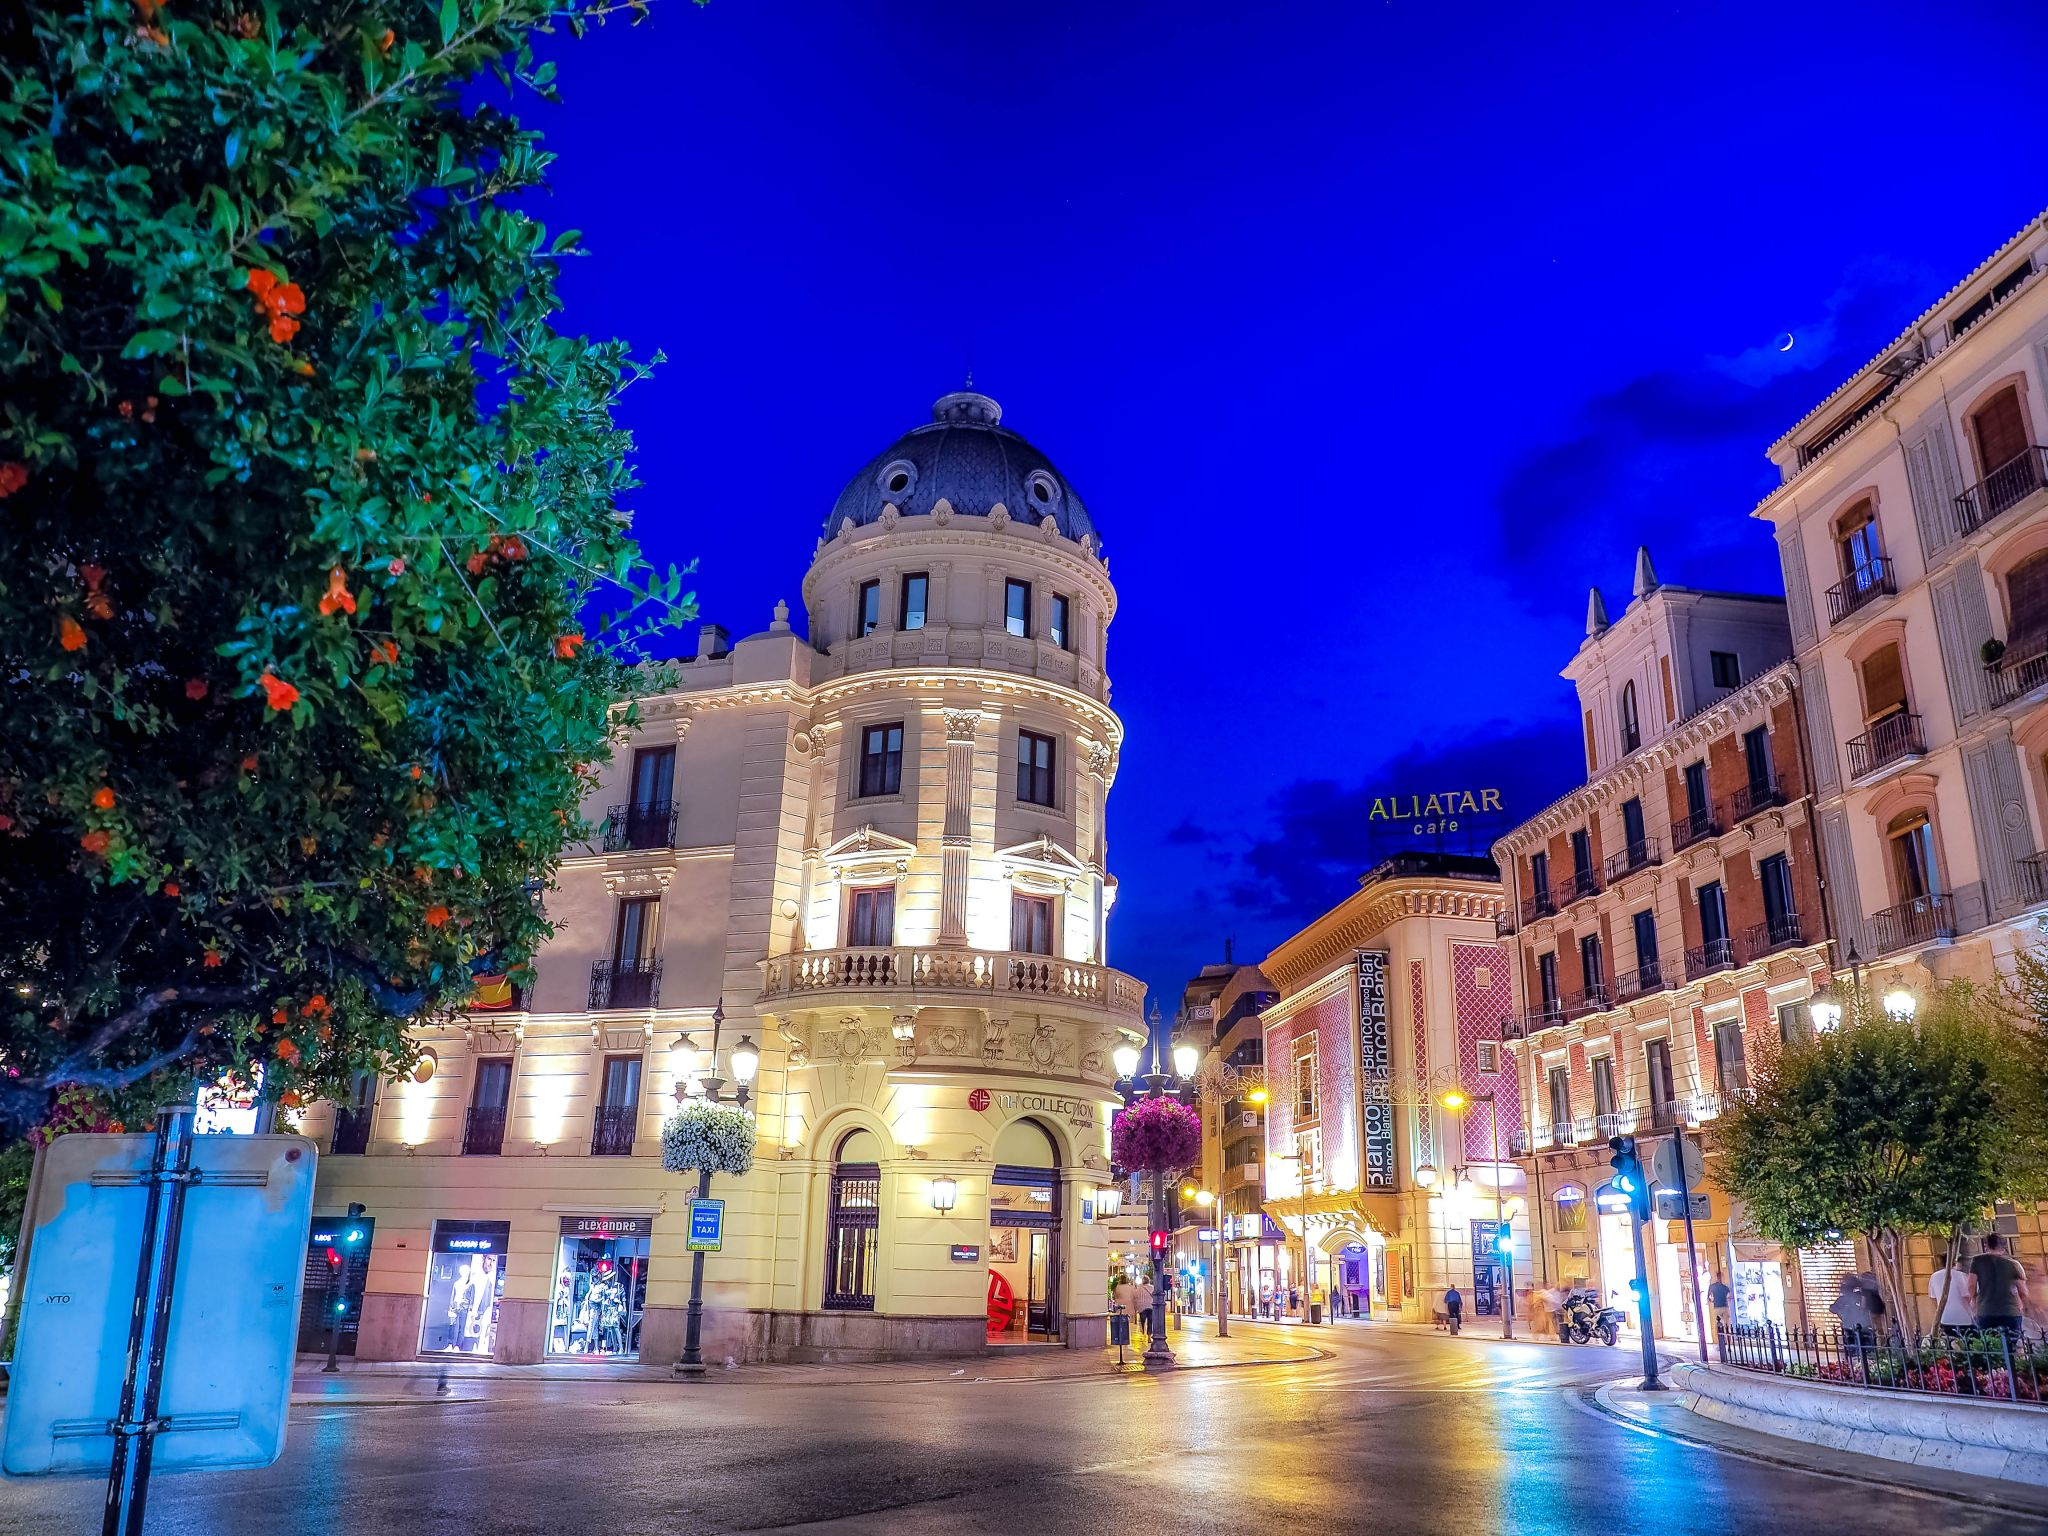 hotel victoria, Spain